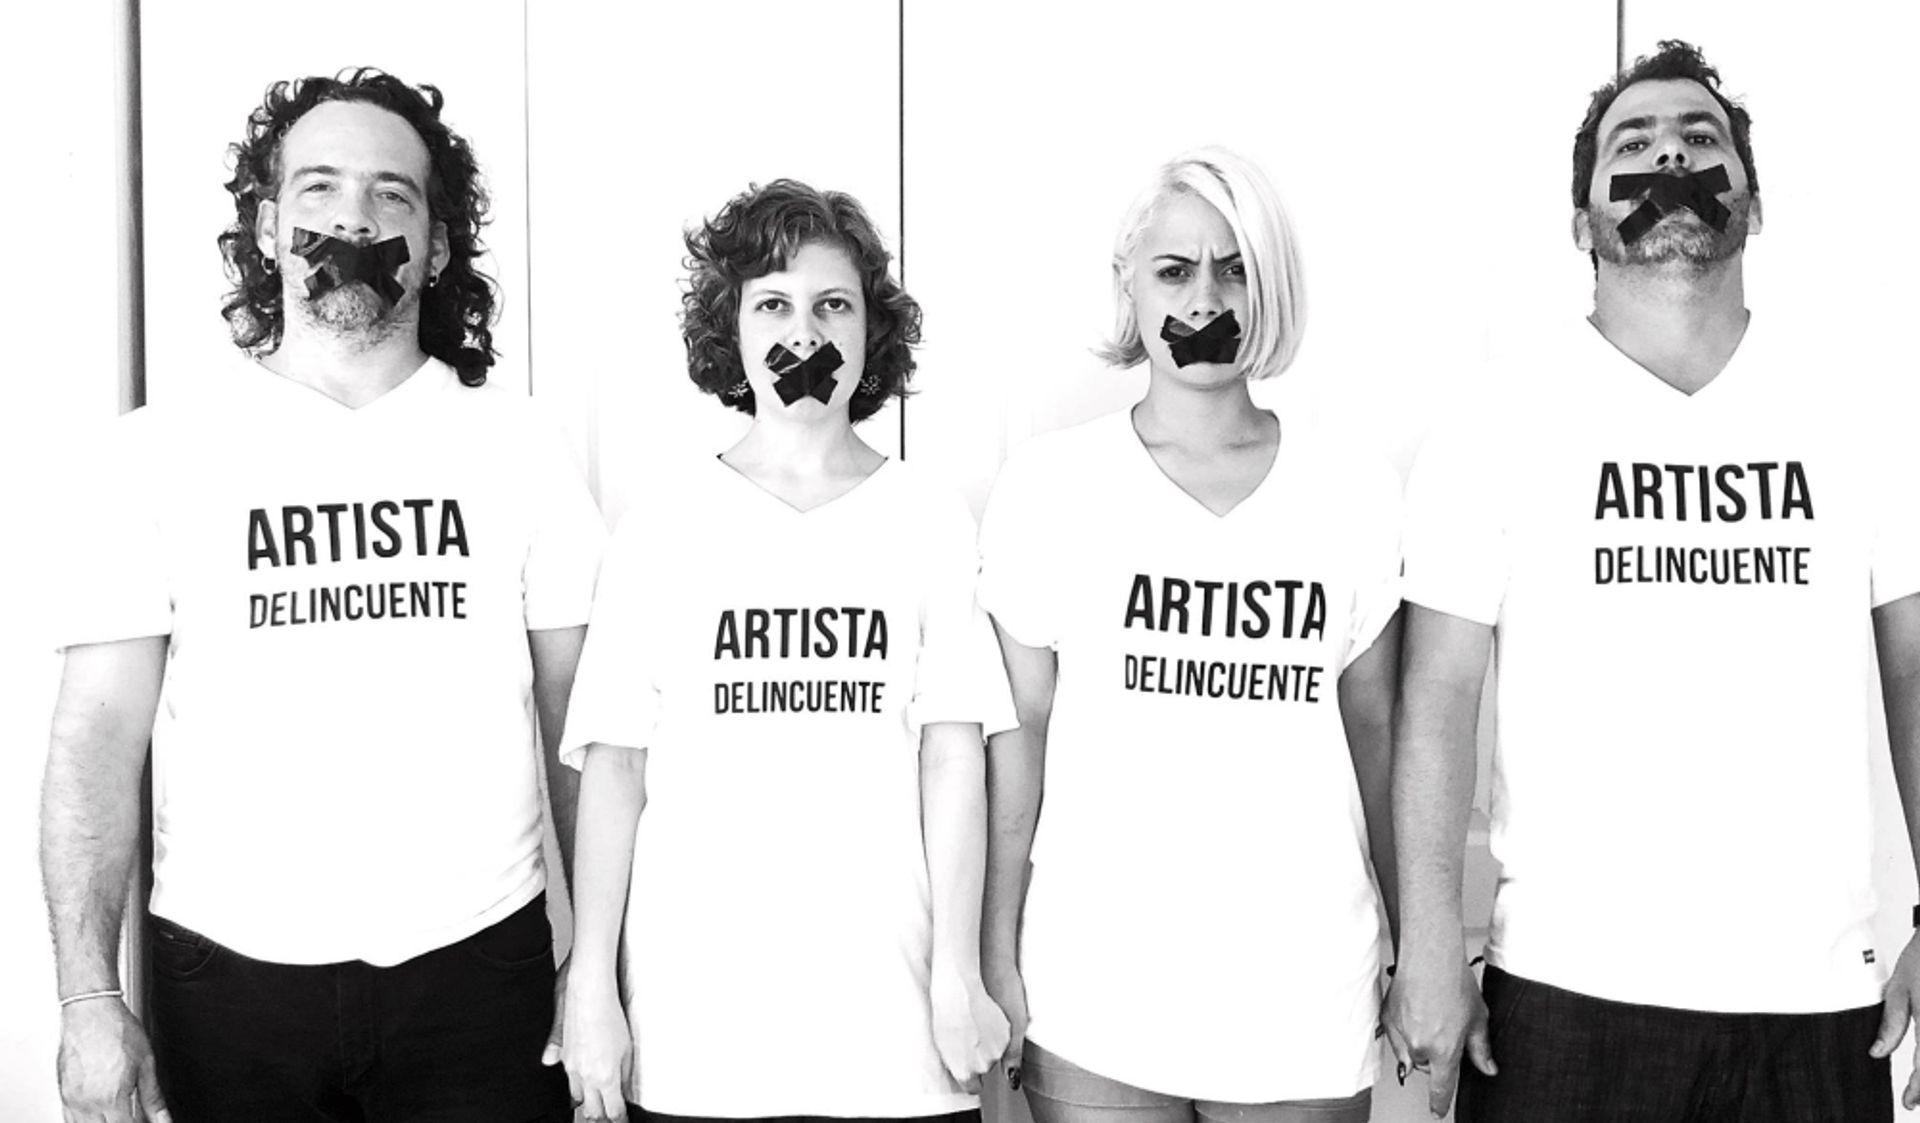 Artists protesting repression of creativity in Cuba Cubalex